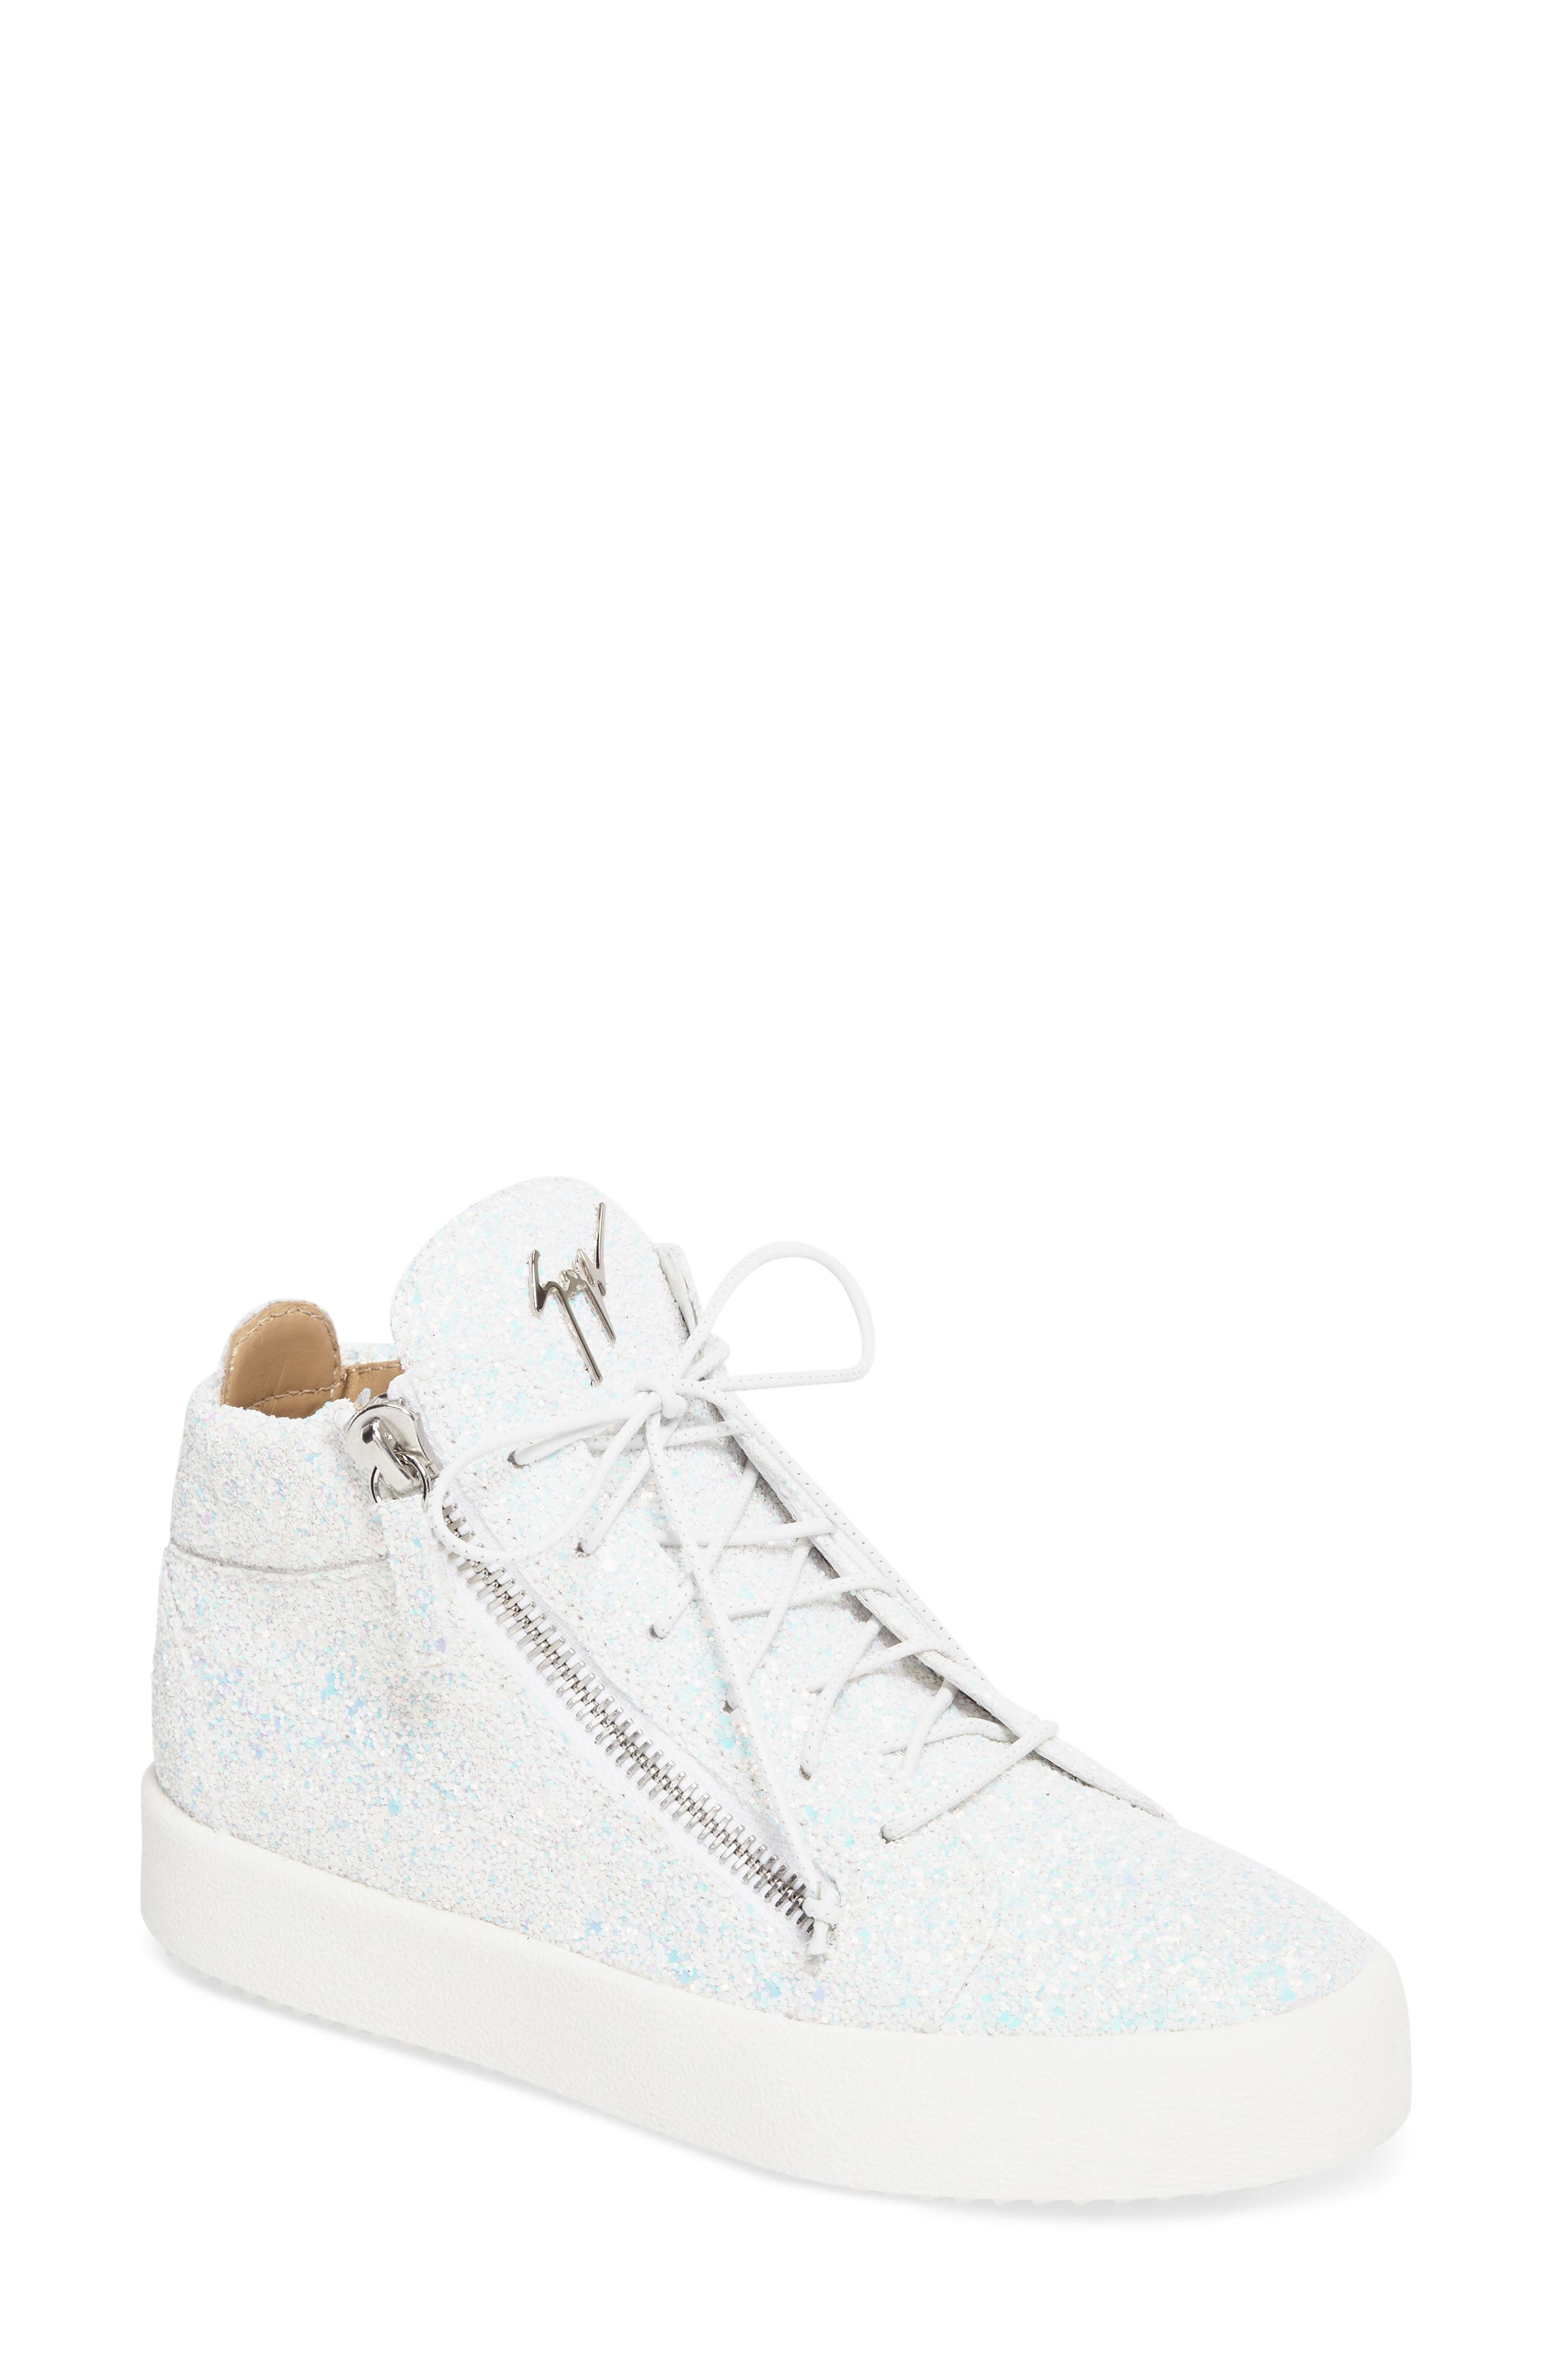 Alternate Image 1 Selected - Giuseppe Zanotti May London High Top Sneaker (Women)